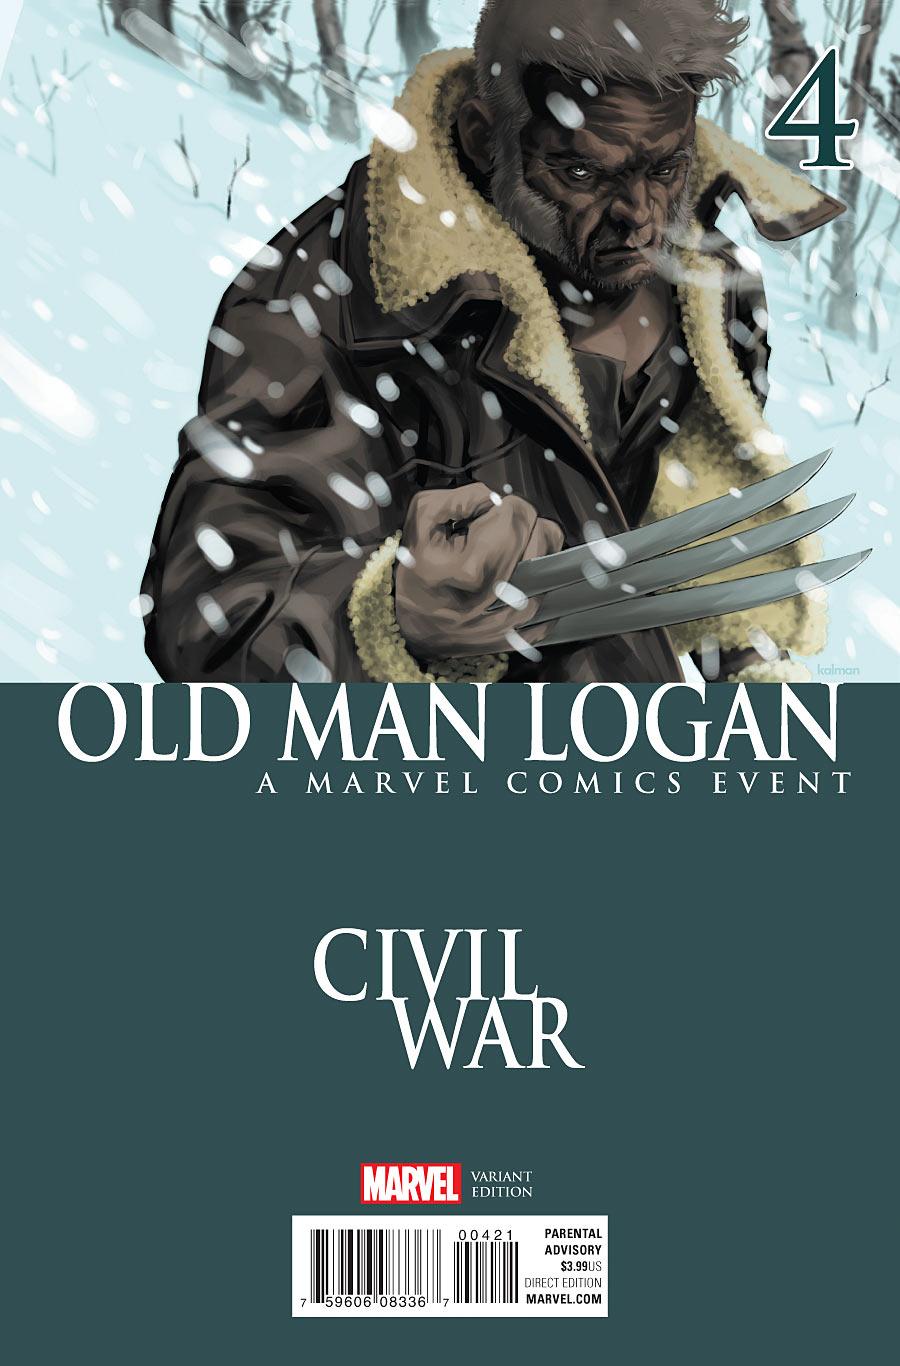 Image old man logan vol 2 4 civil war variantg marvel old man logan vol 2 4 civil war variantg altavistaventures Gallery